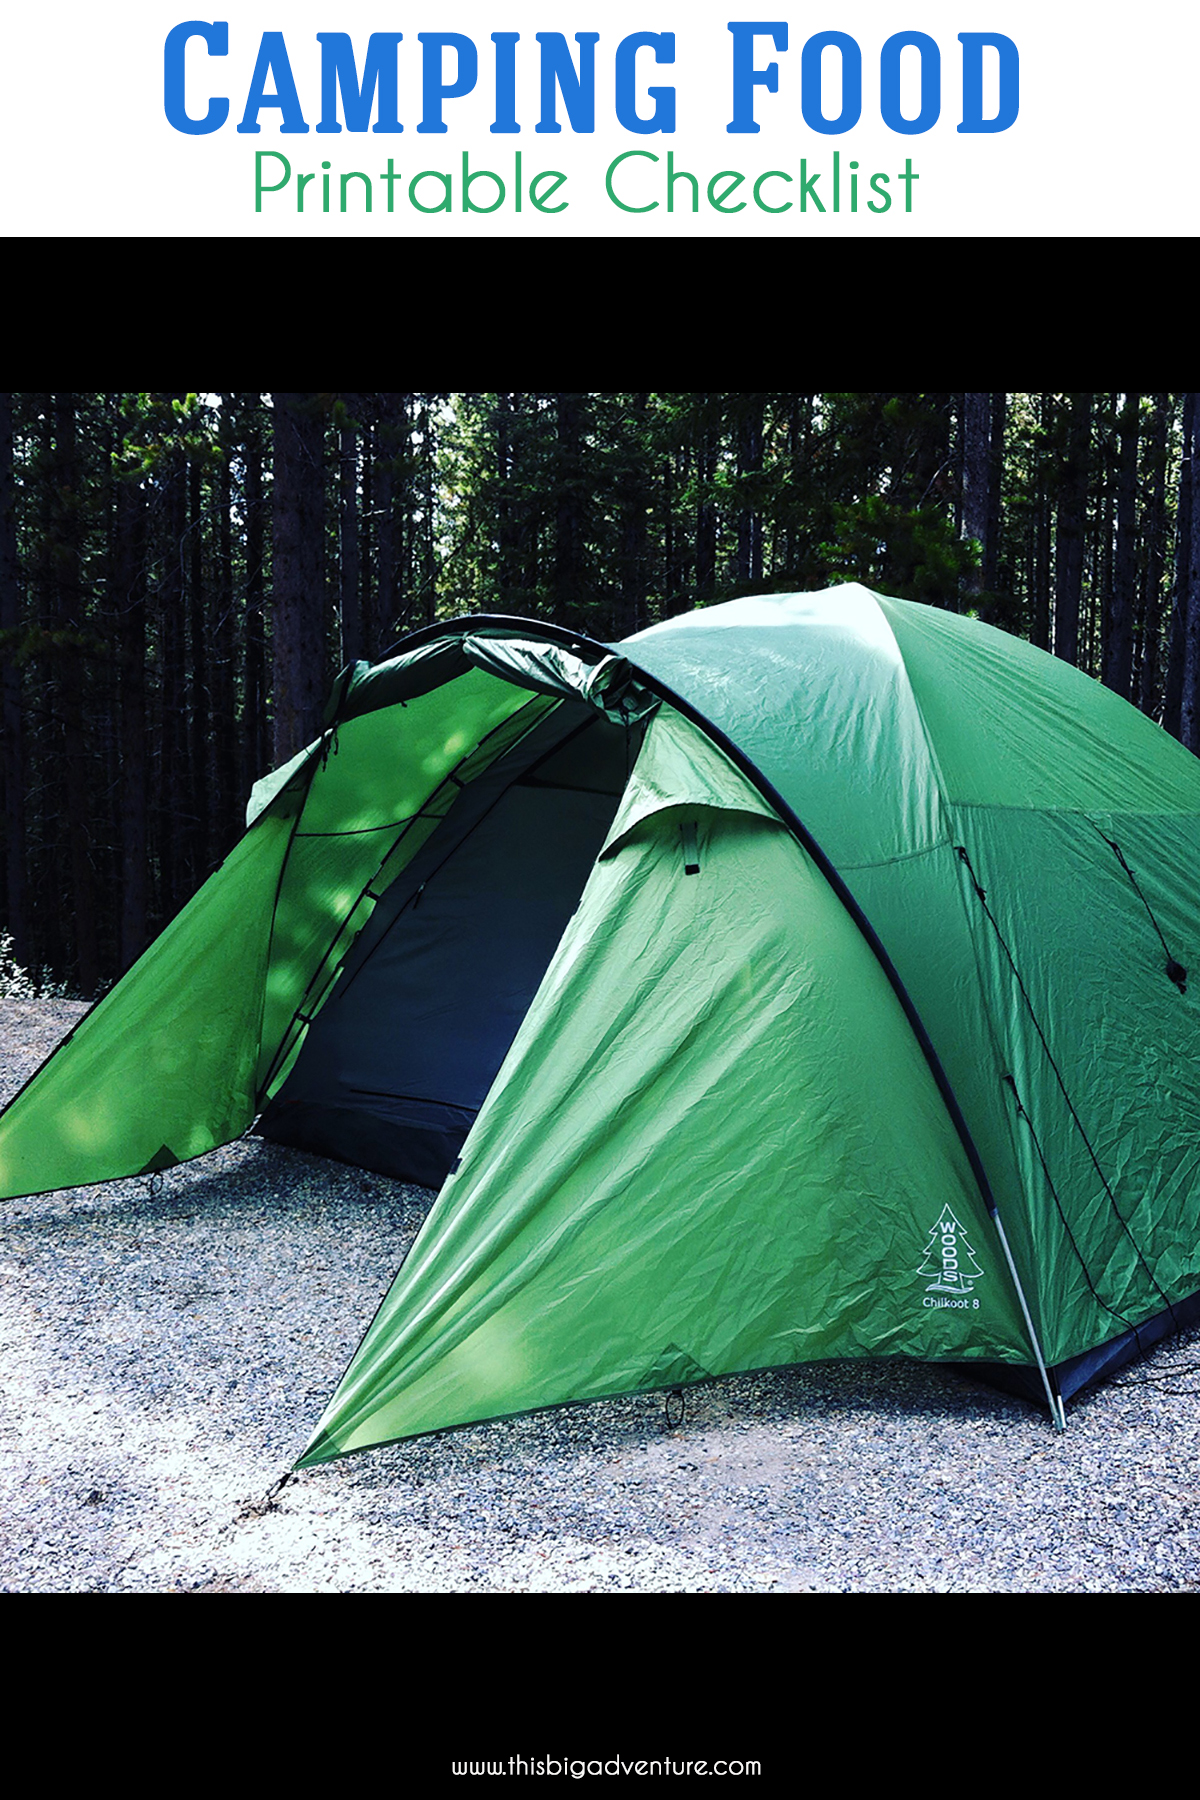 Camping Food Printable Checklist